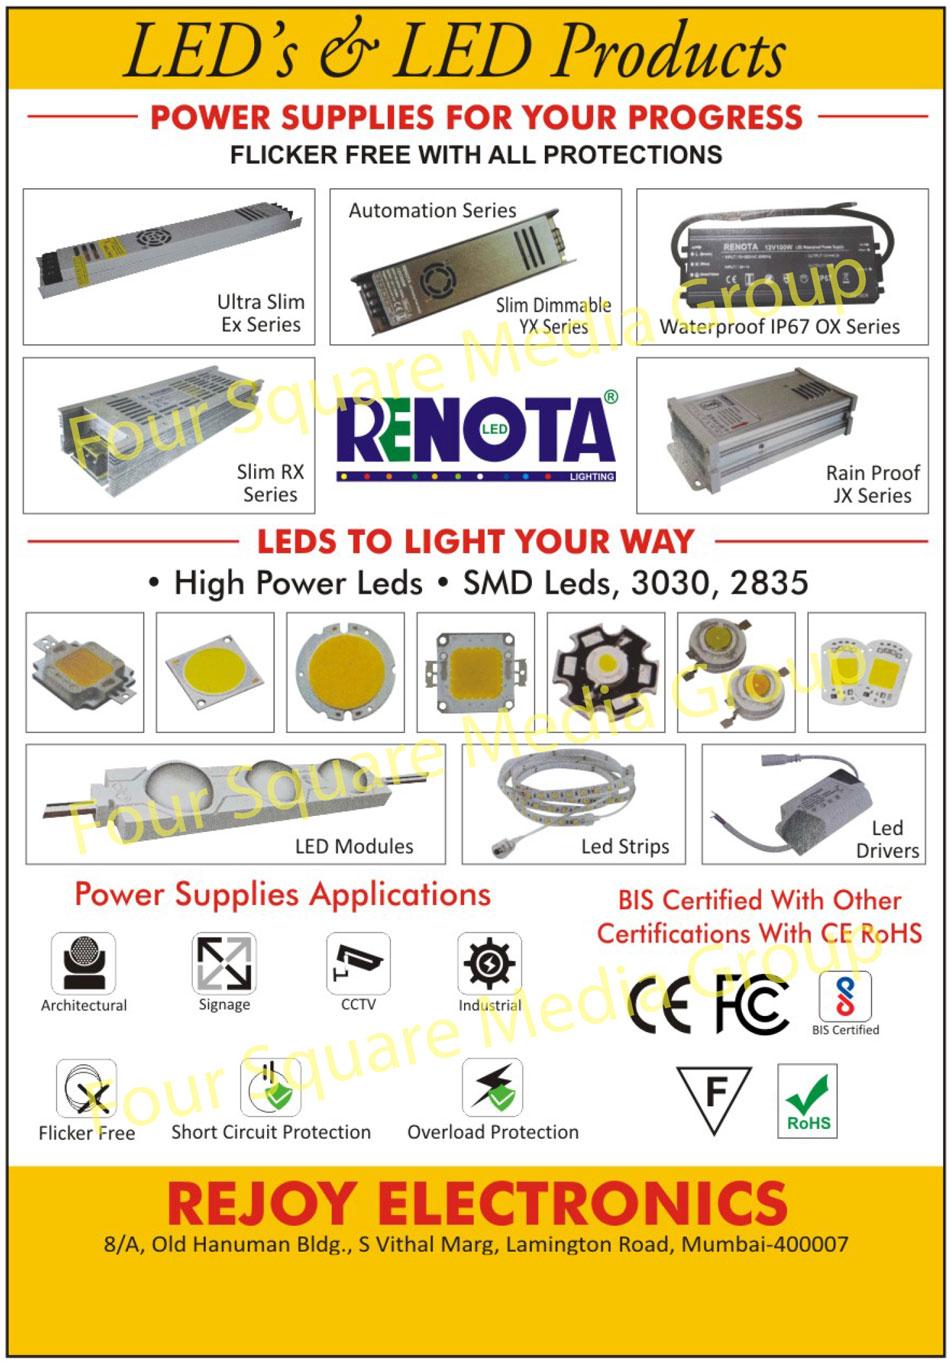 Leds, Led Products, Power Supplies, High Power Leds, SMD Leds, Led Modules, Led Strips, Led Drivers